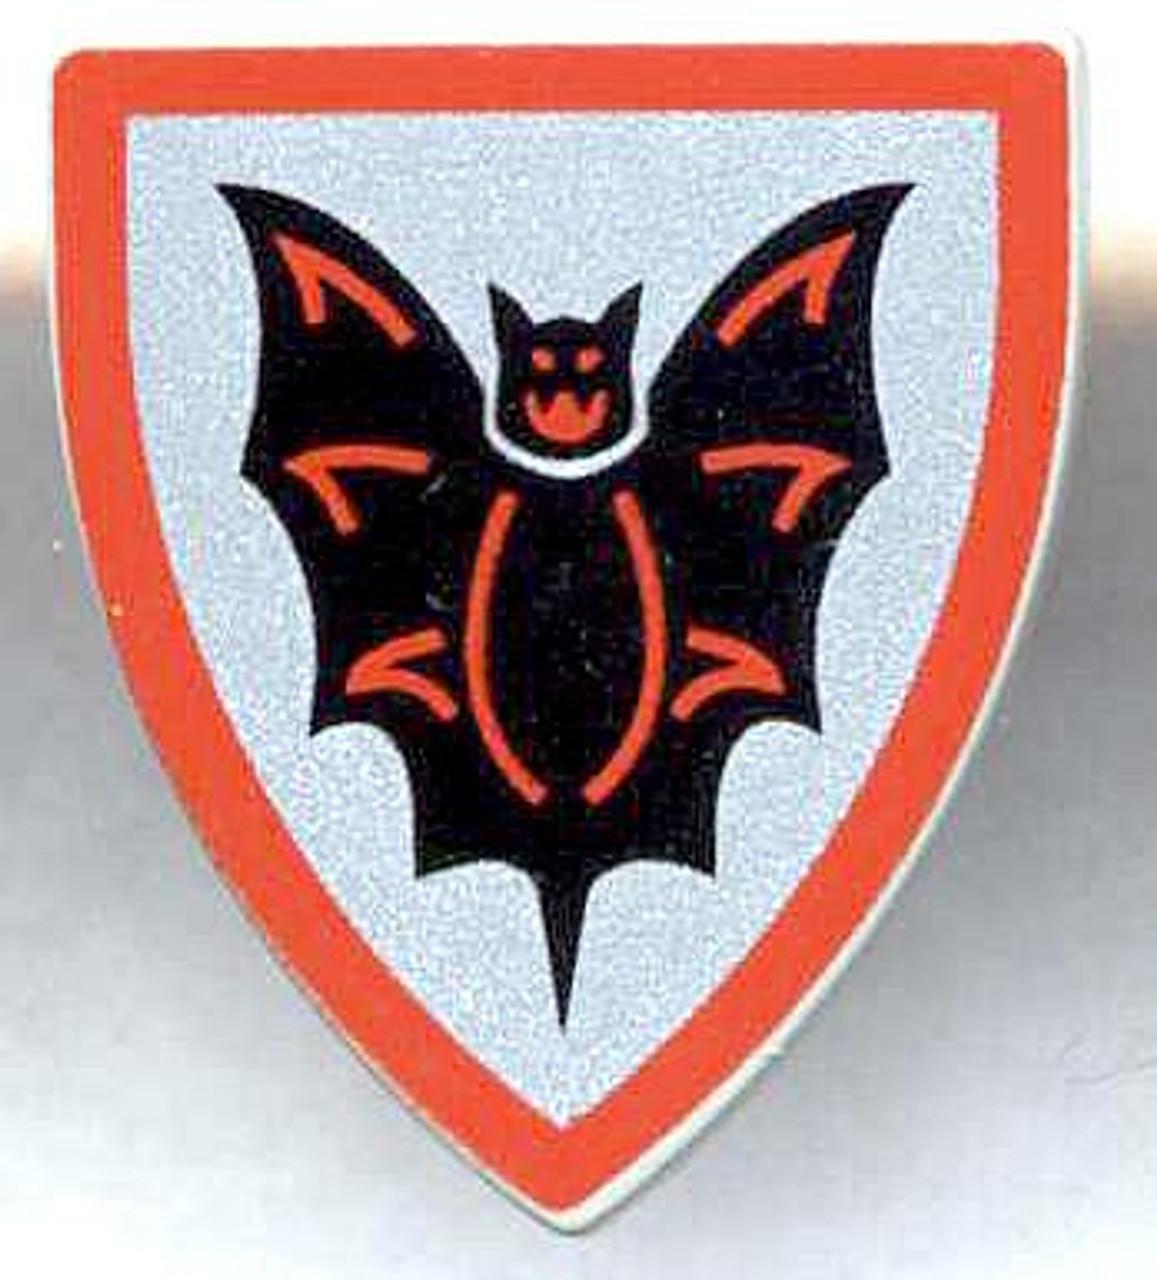 LEGO Castle Shields Small Bat Shield [Loose]